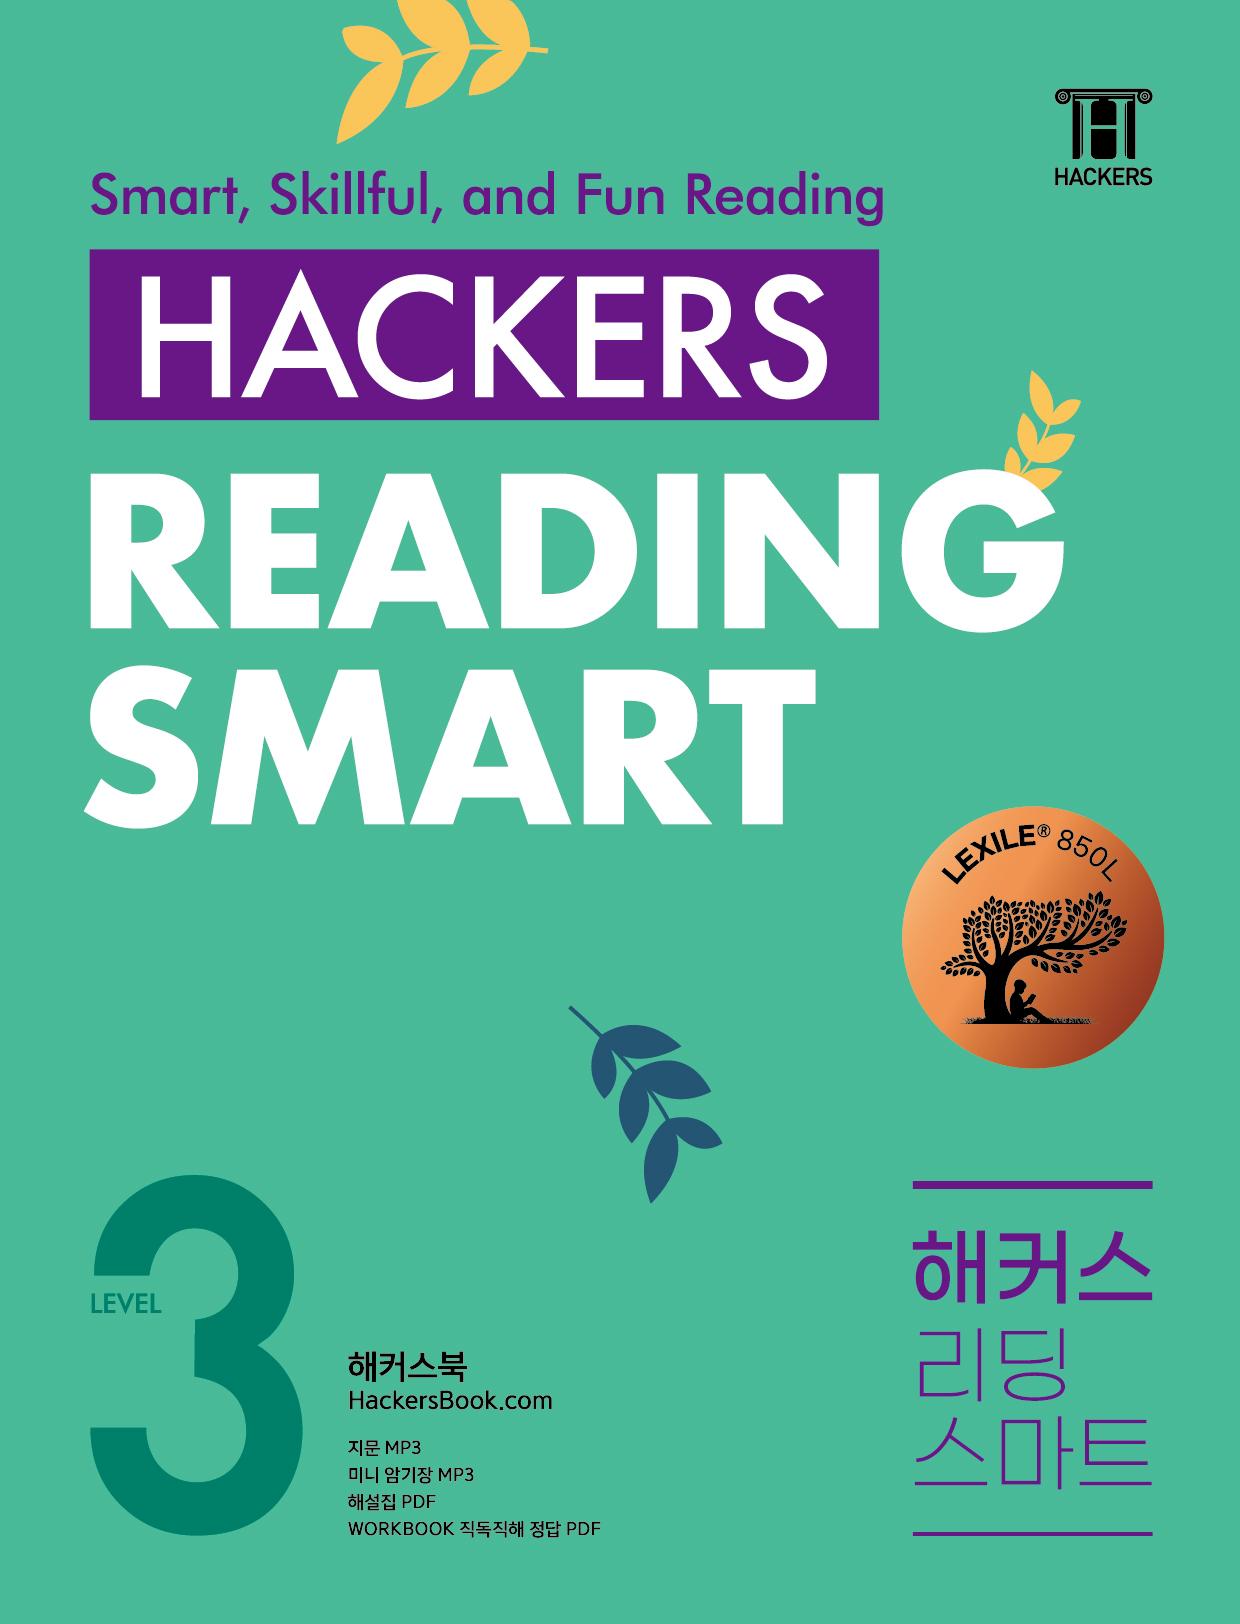 Hackers Reading Smart Level 3